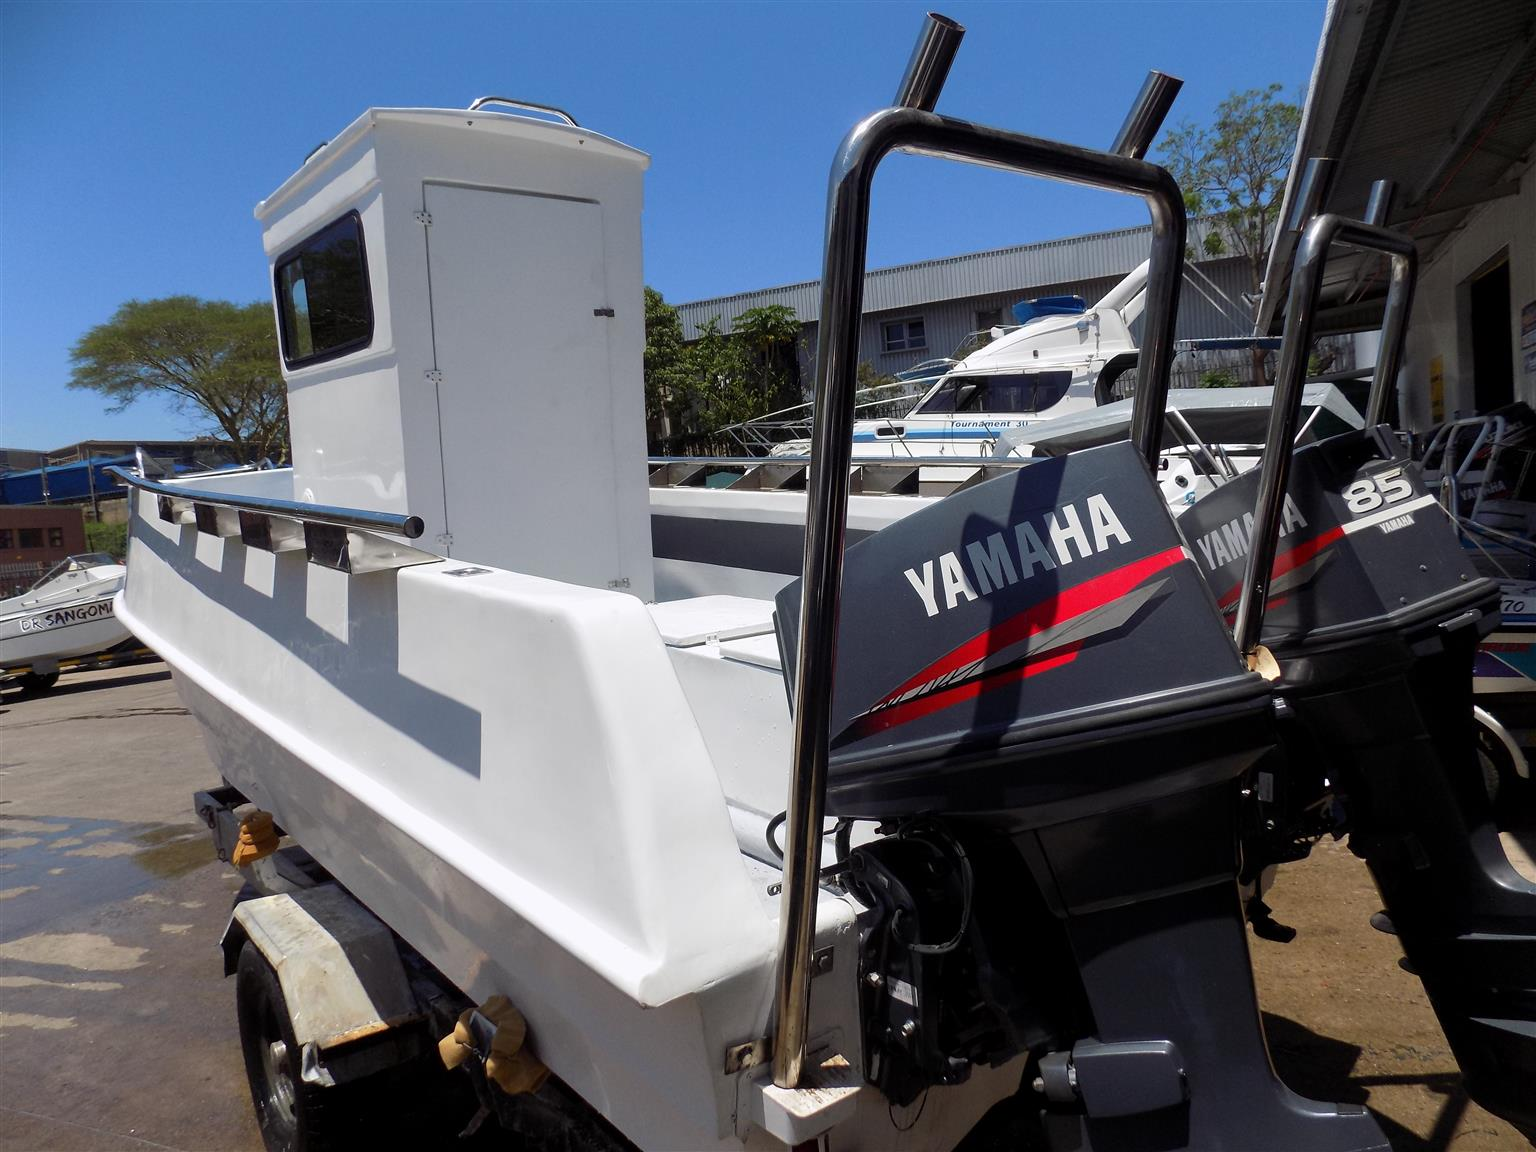 supercat 21 ft on  dolly trailer 2 x 85 hp yamaha trims